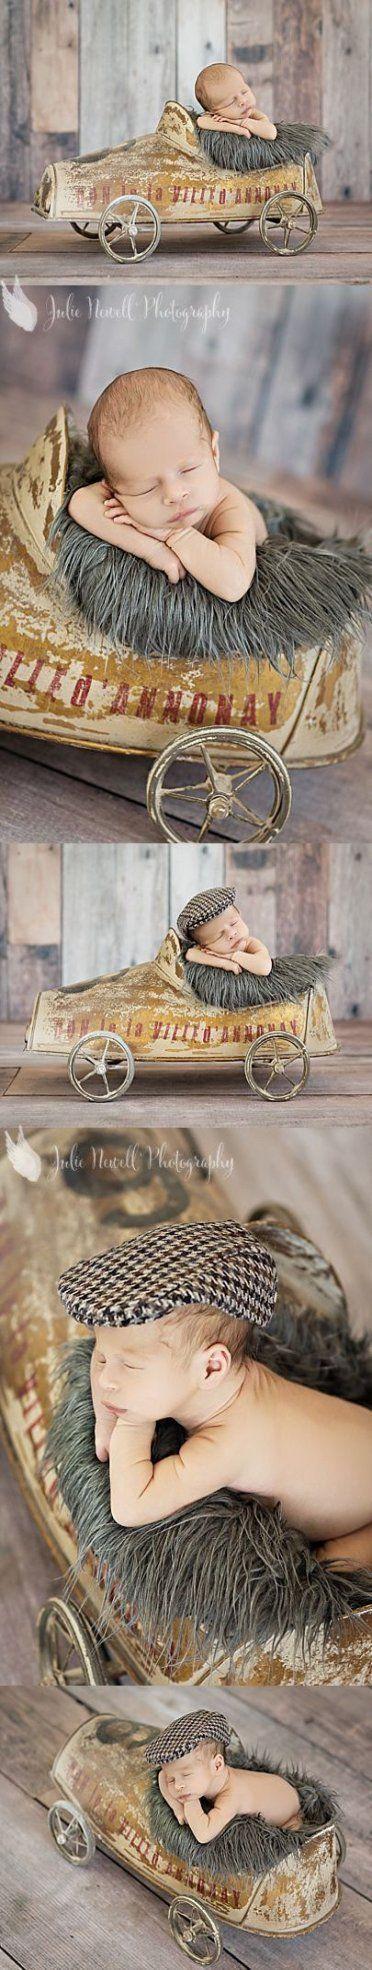 Baby photoshoot boy photographers 67 Ideas